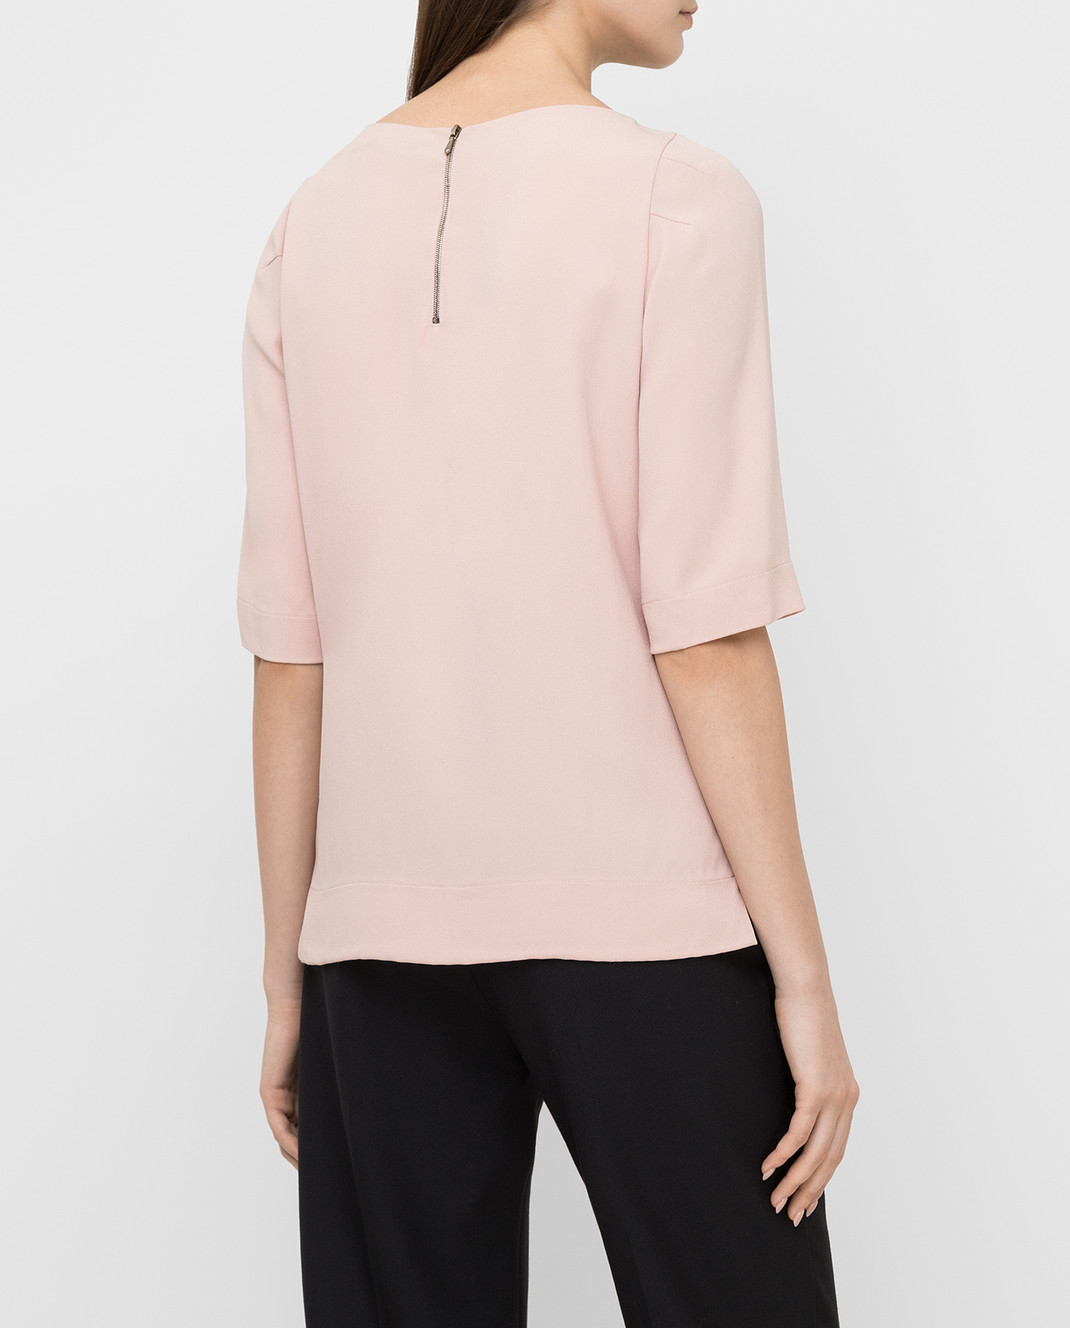 Jenny Packham Пудровая блуза с кристаллами WT104 изображение 4